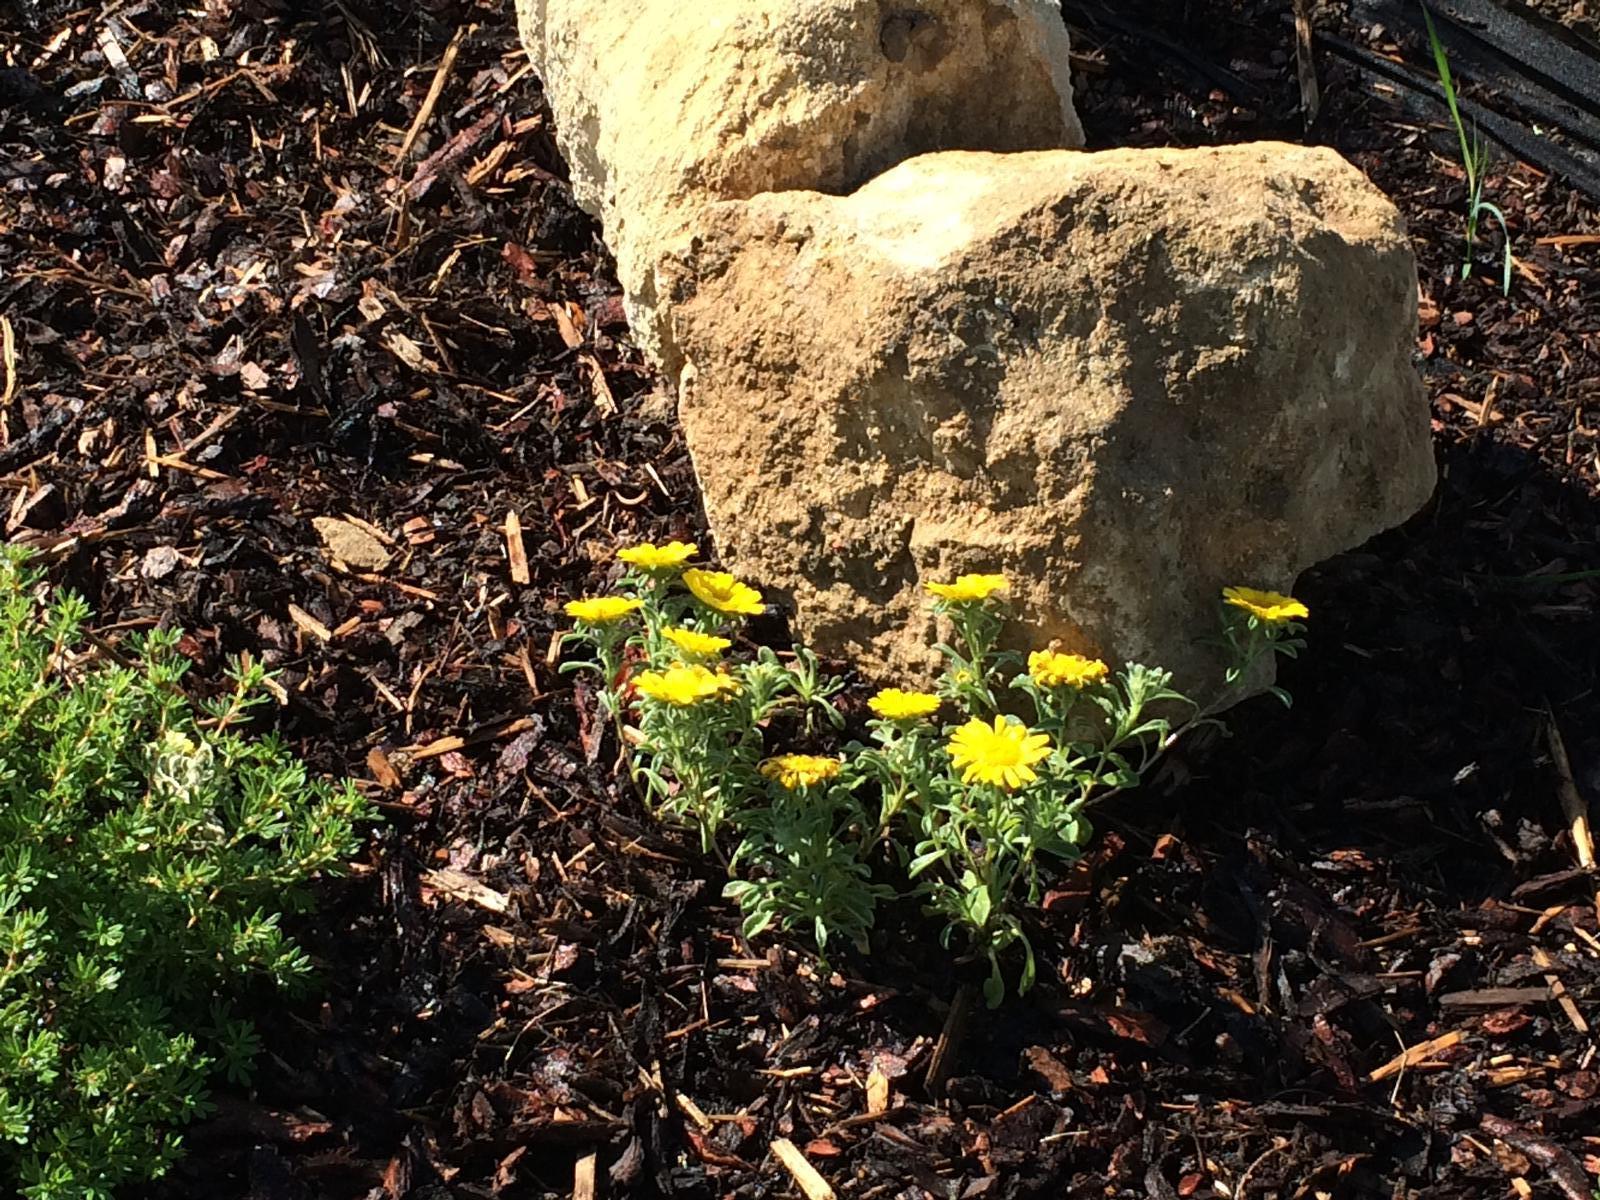 Zahrada- jak to vsechno zacalo.. - vypadaju ako male slniecka, tak dufam ze sa im na slniecku darit bude :)